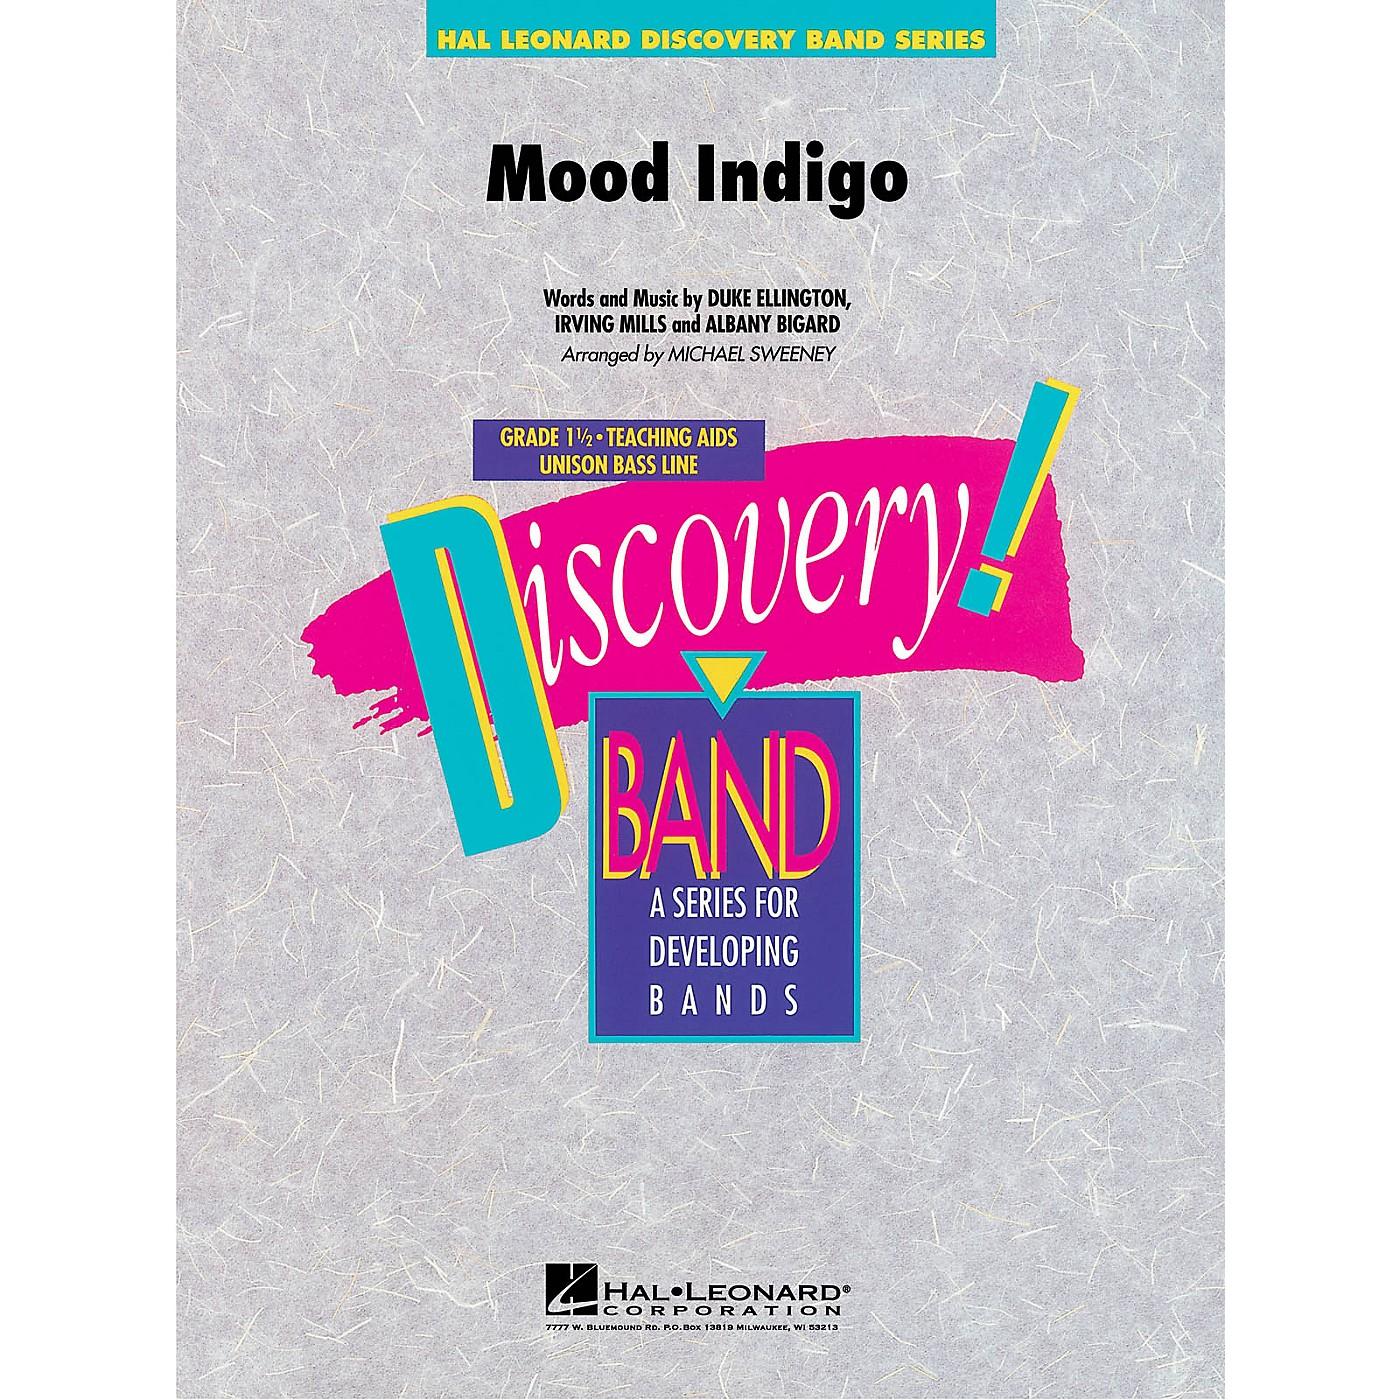 Hal Leonard Mood Indigo Concert Band Level 1.5 by Duke Ellington Arranged by Michael Sweeney thumbnail